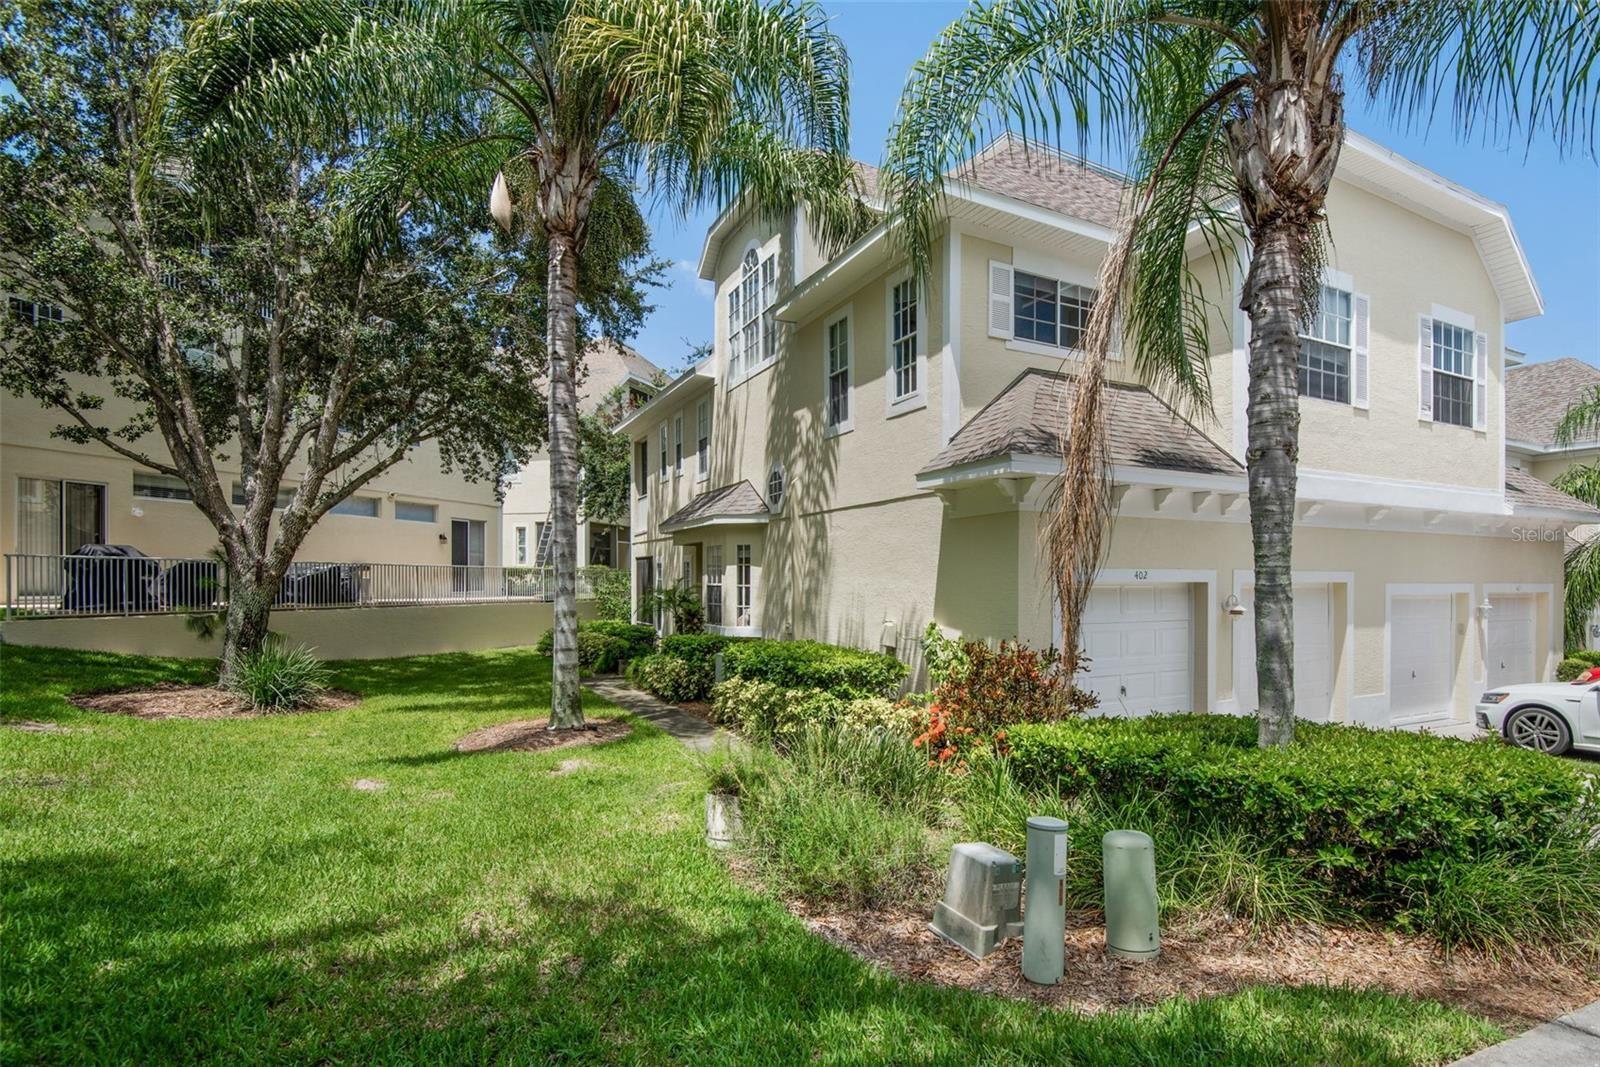 98 S HIGHLAND AVENUE #402, Tarpon Springs, FL 34689 - MLS#: W7836593